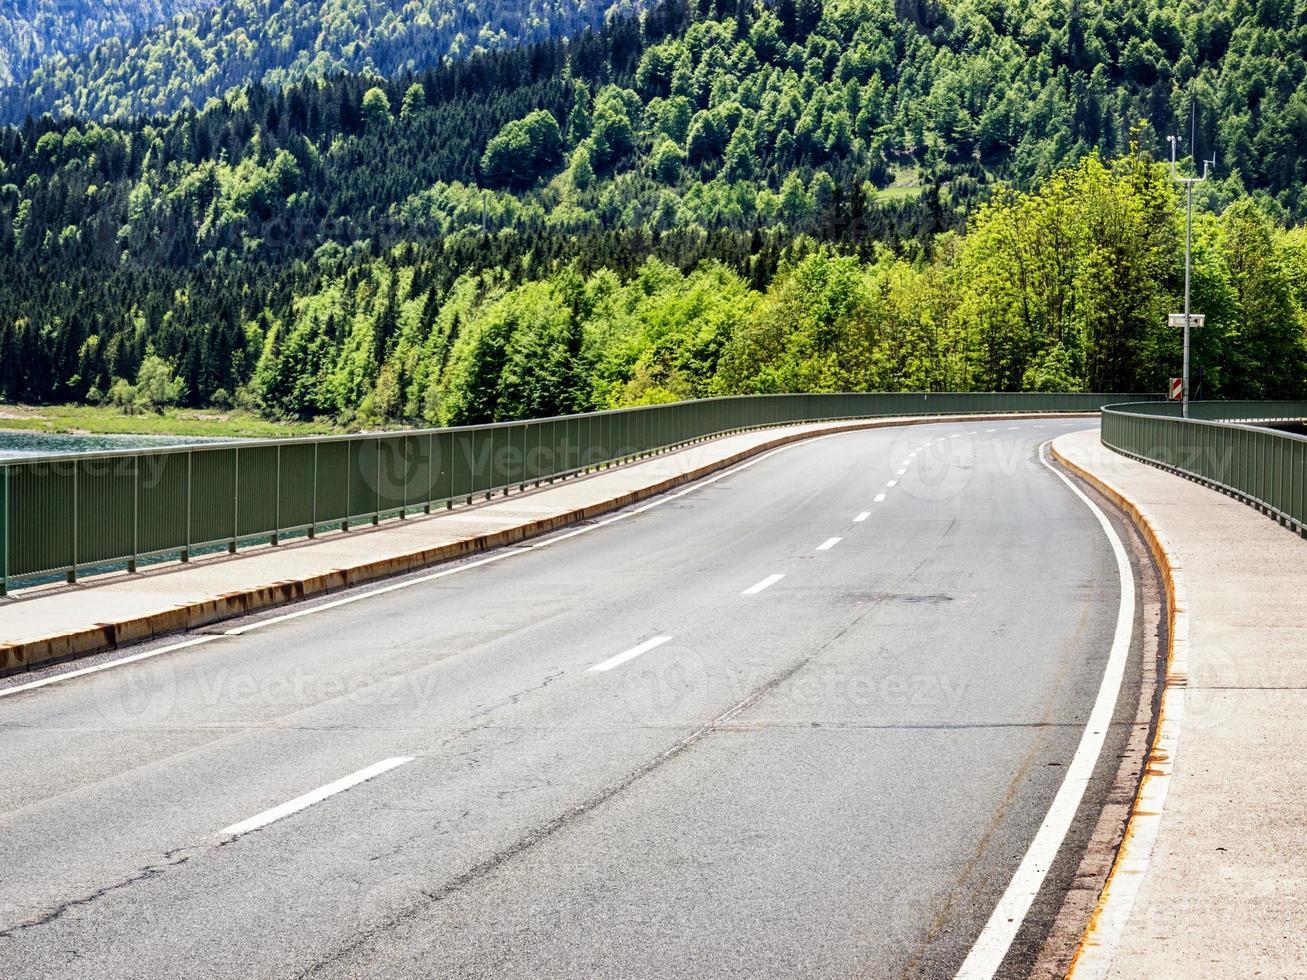 route de campagne photo